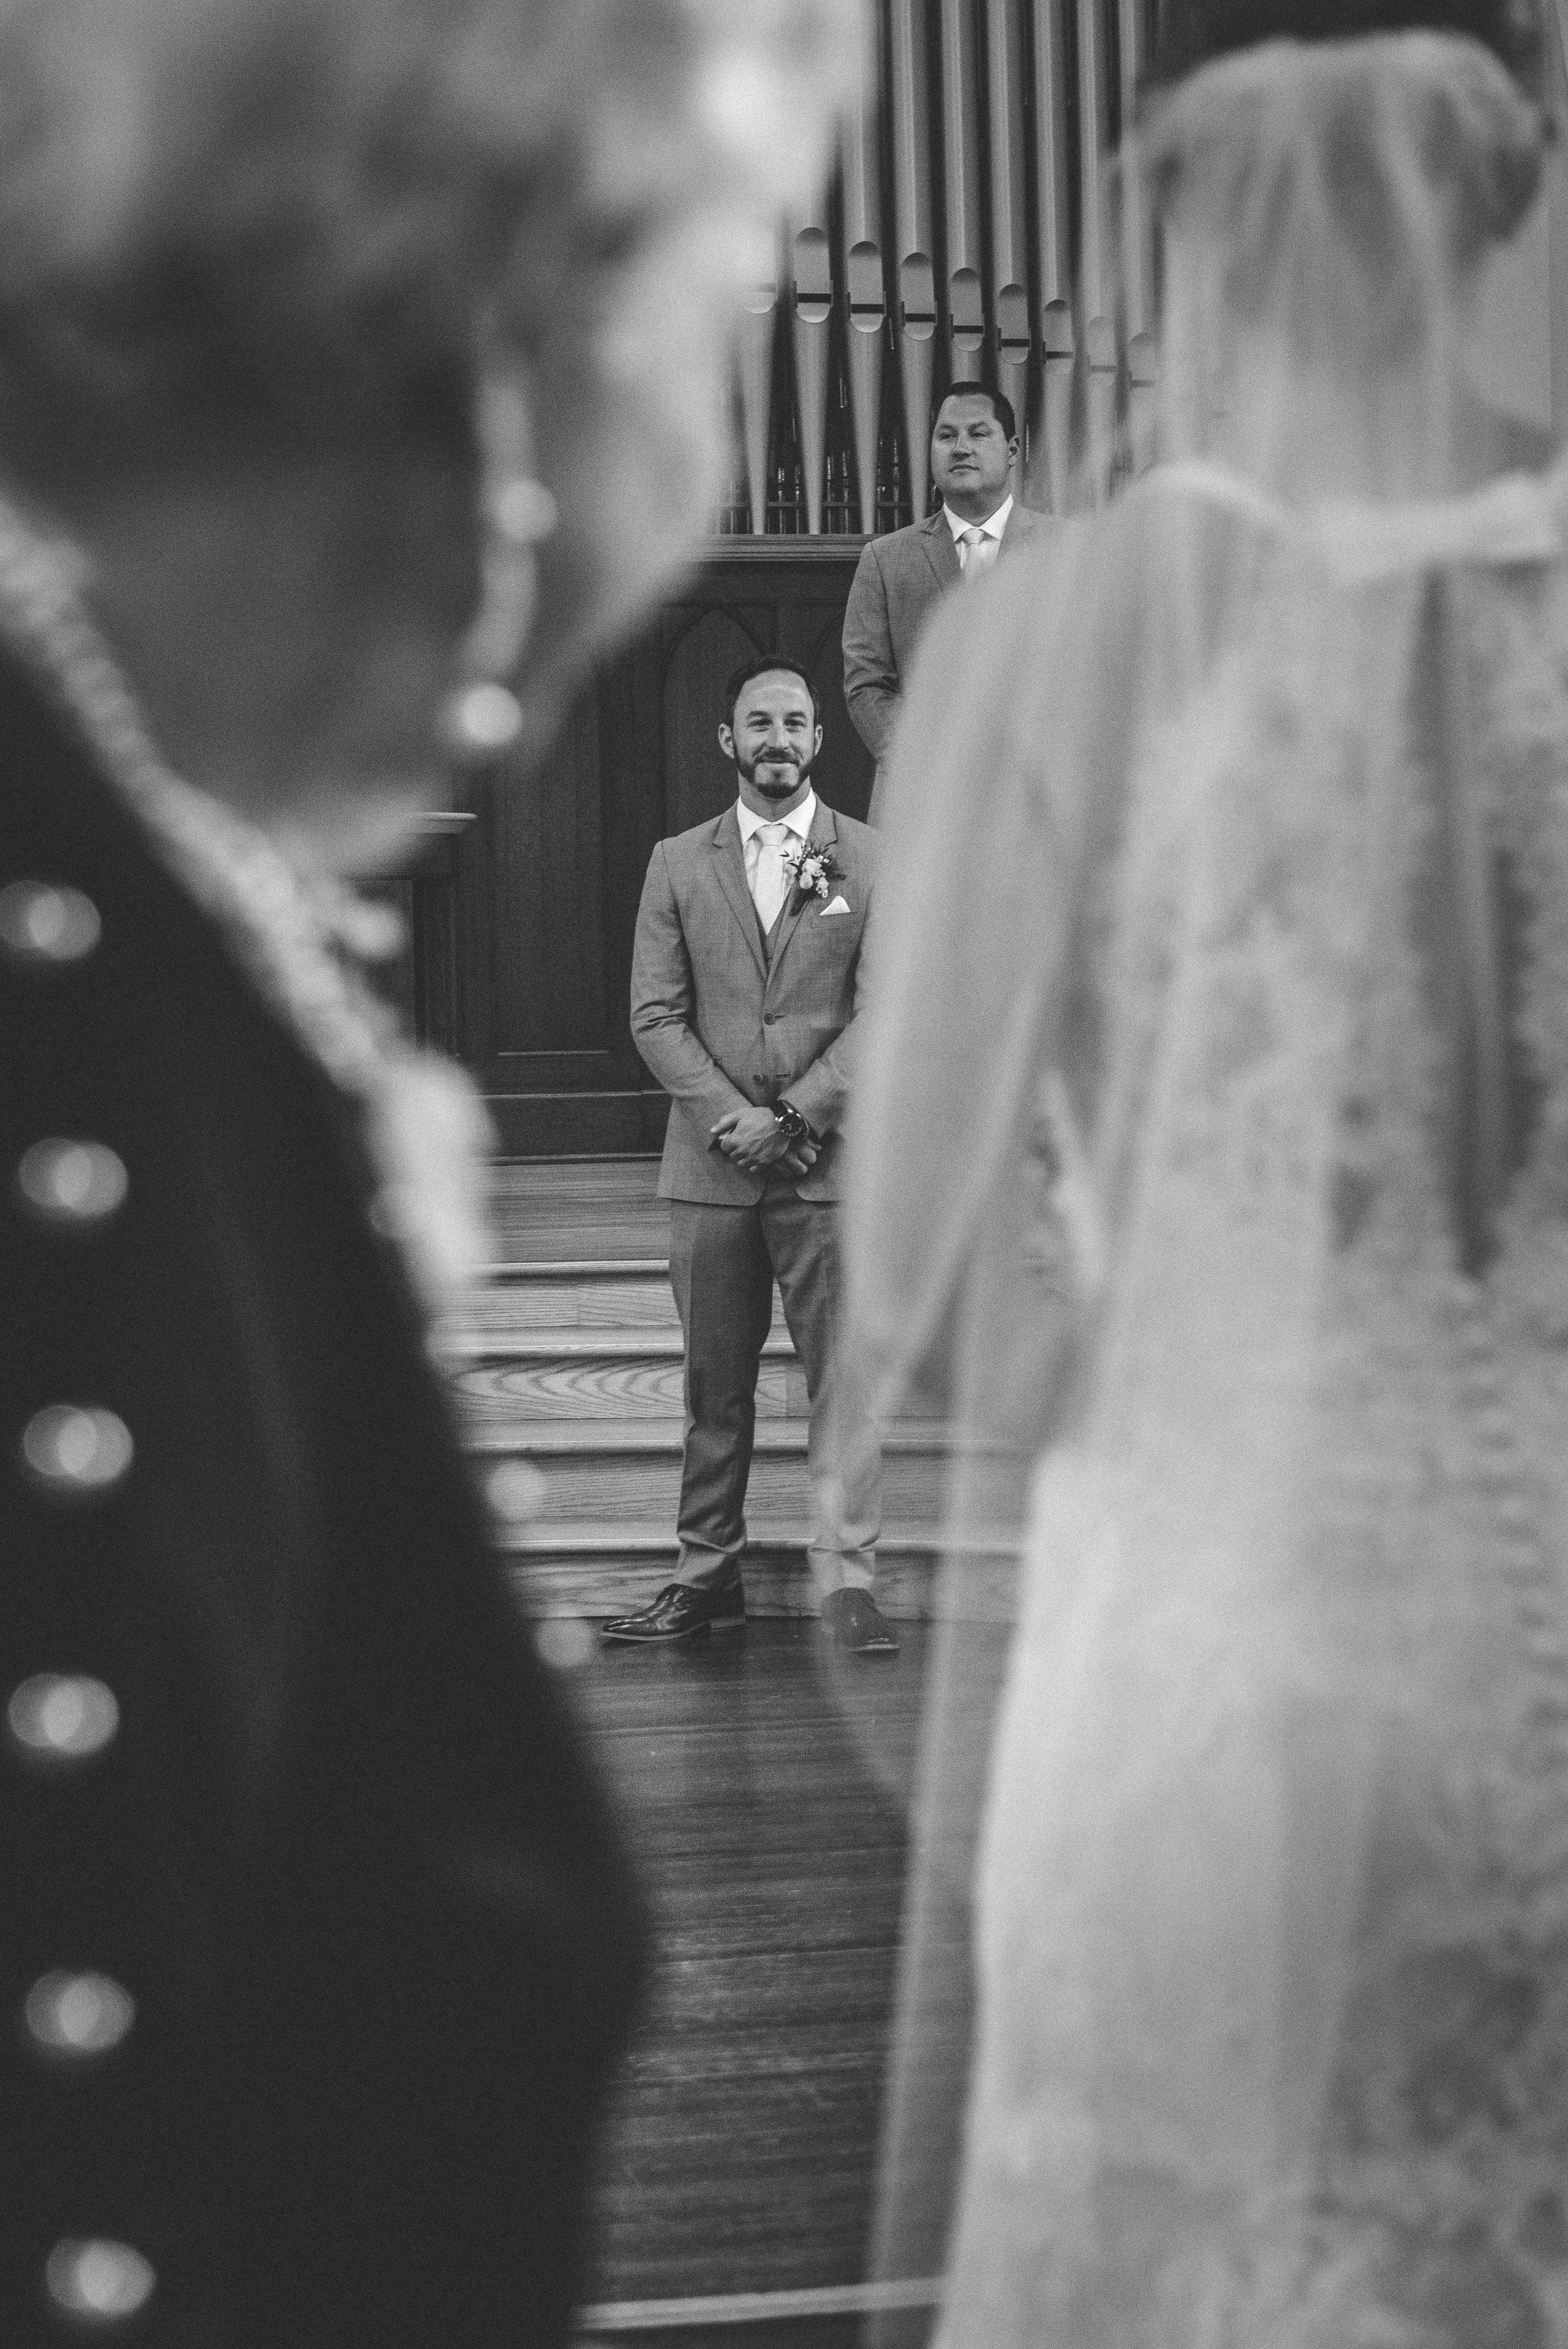 ChadFahnestockPhotography-mc-wedding-010.jpg